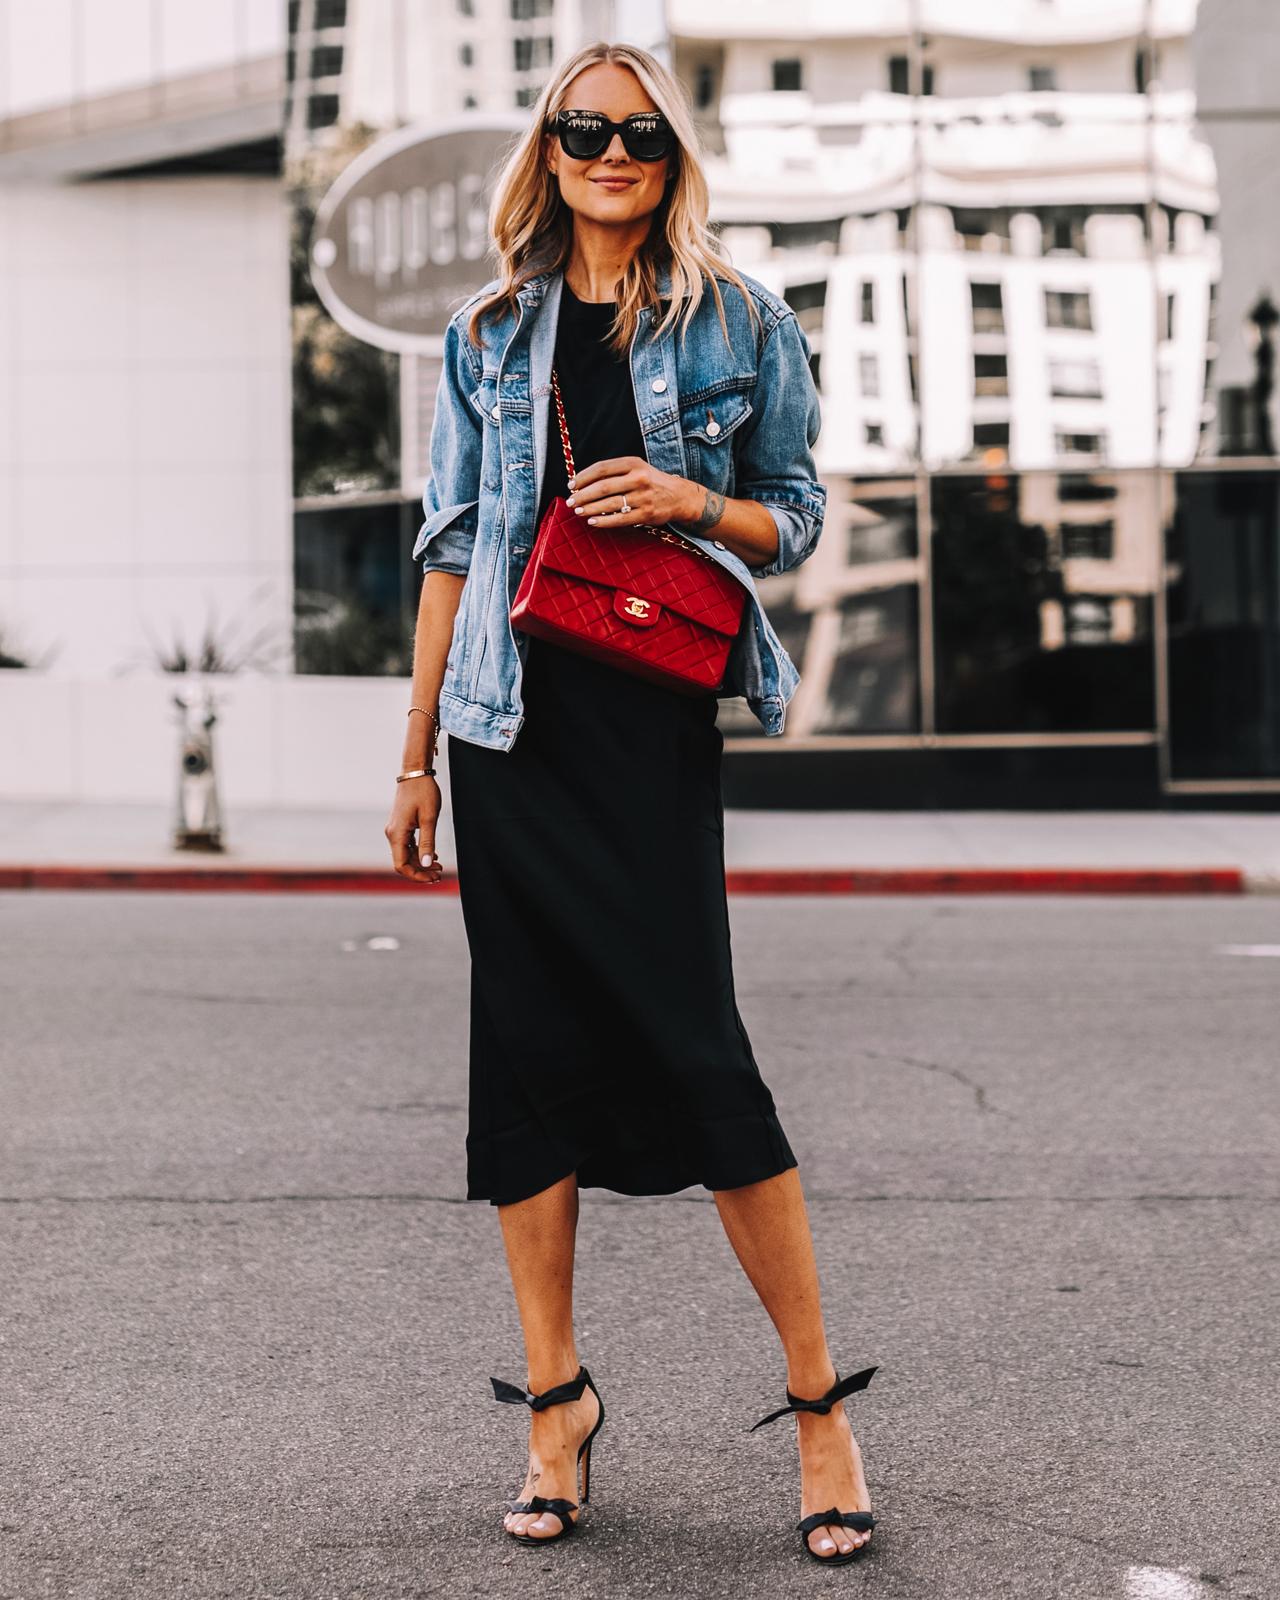 Fashion Jackson Wearing Anine Bing Black Slip Skirt Denim Jacket Red Chanel Handbag Black Heeled Sandals